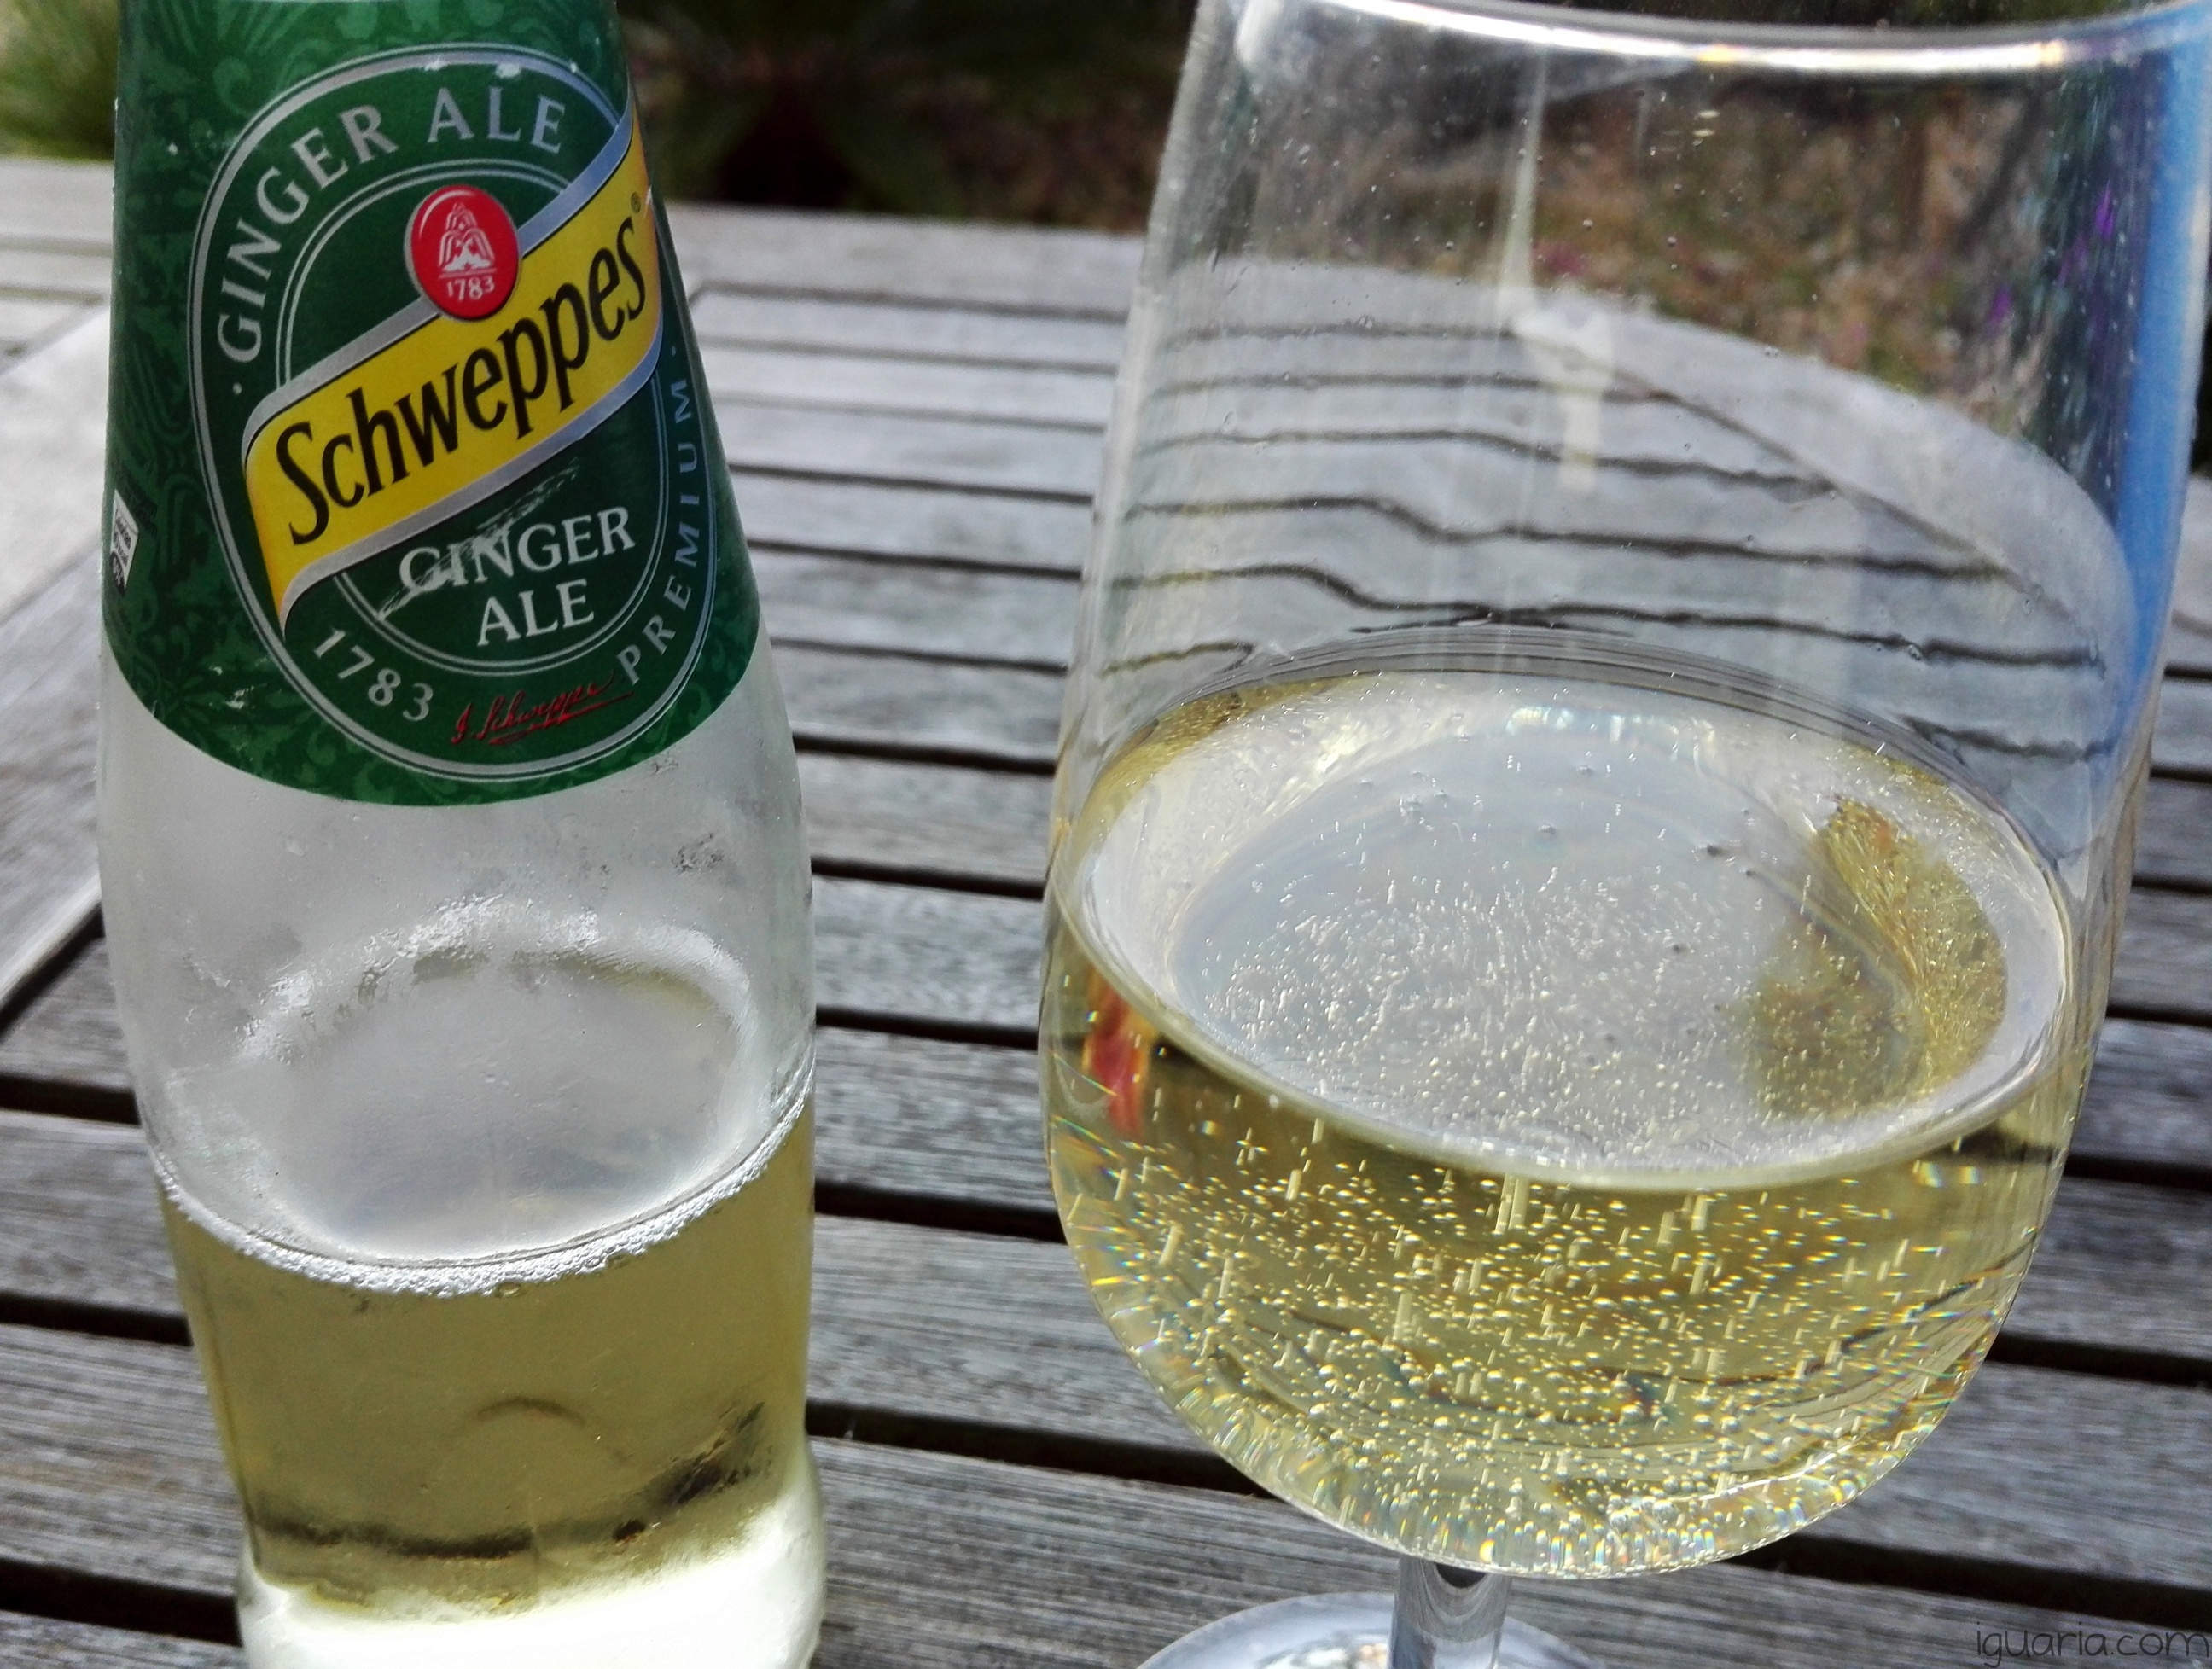 Iguaria_Schweppes-Ginger-Ale-no-copo